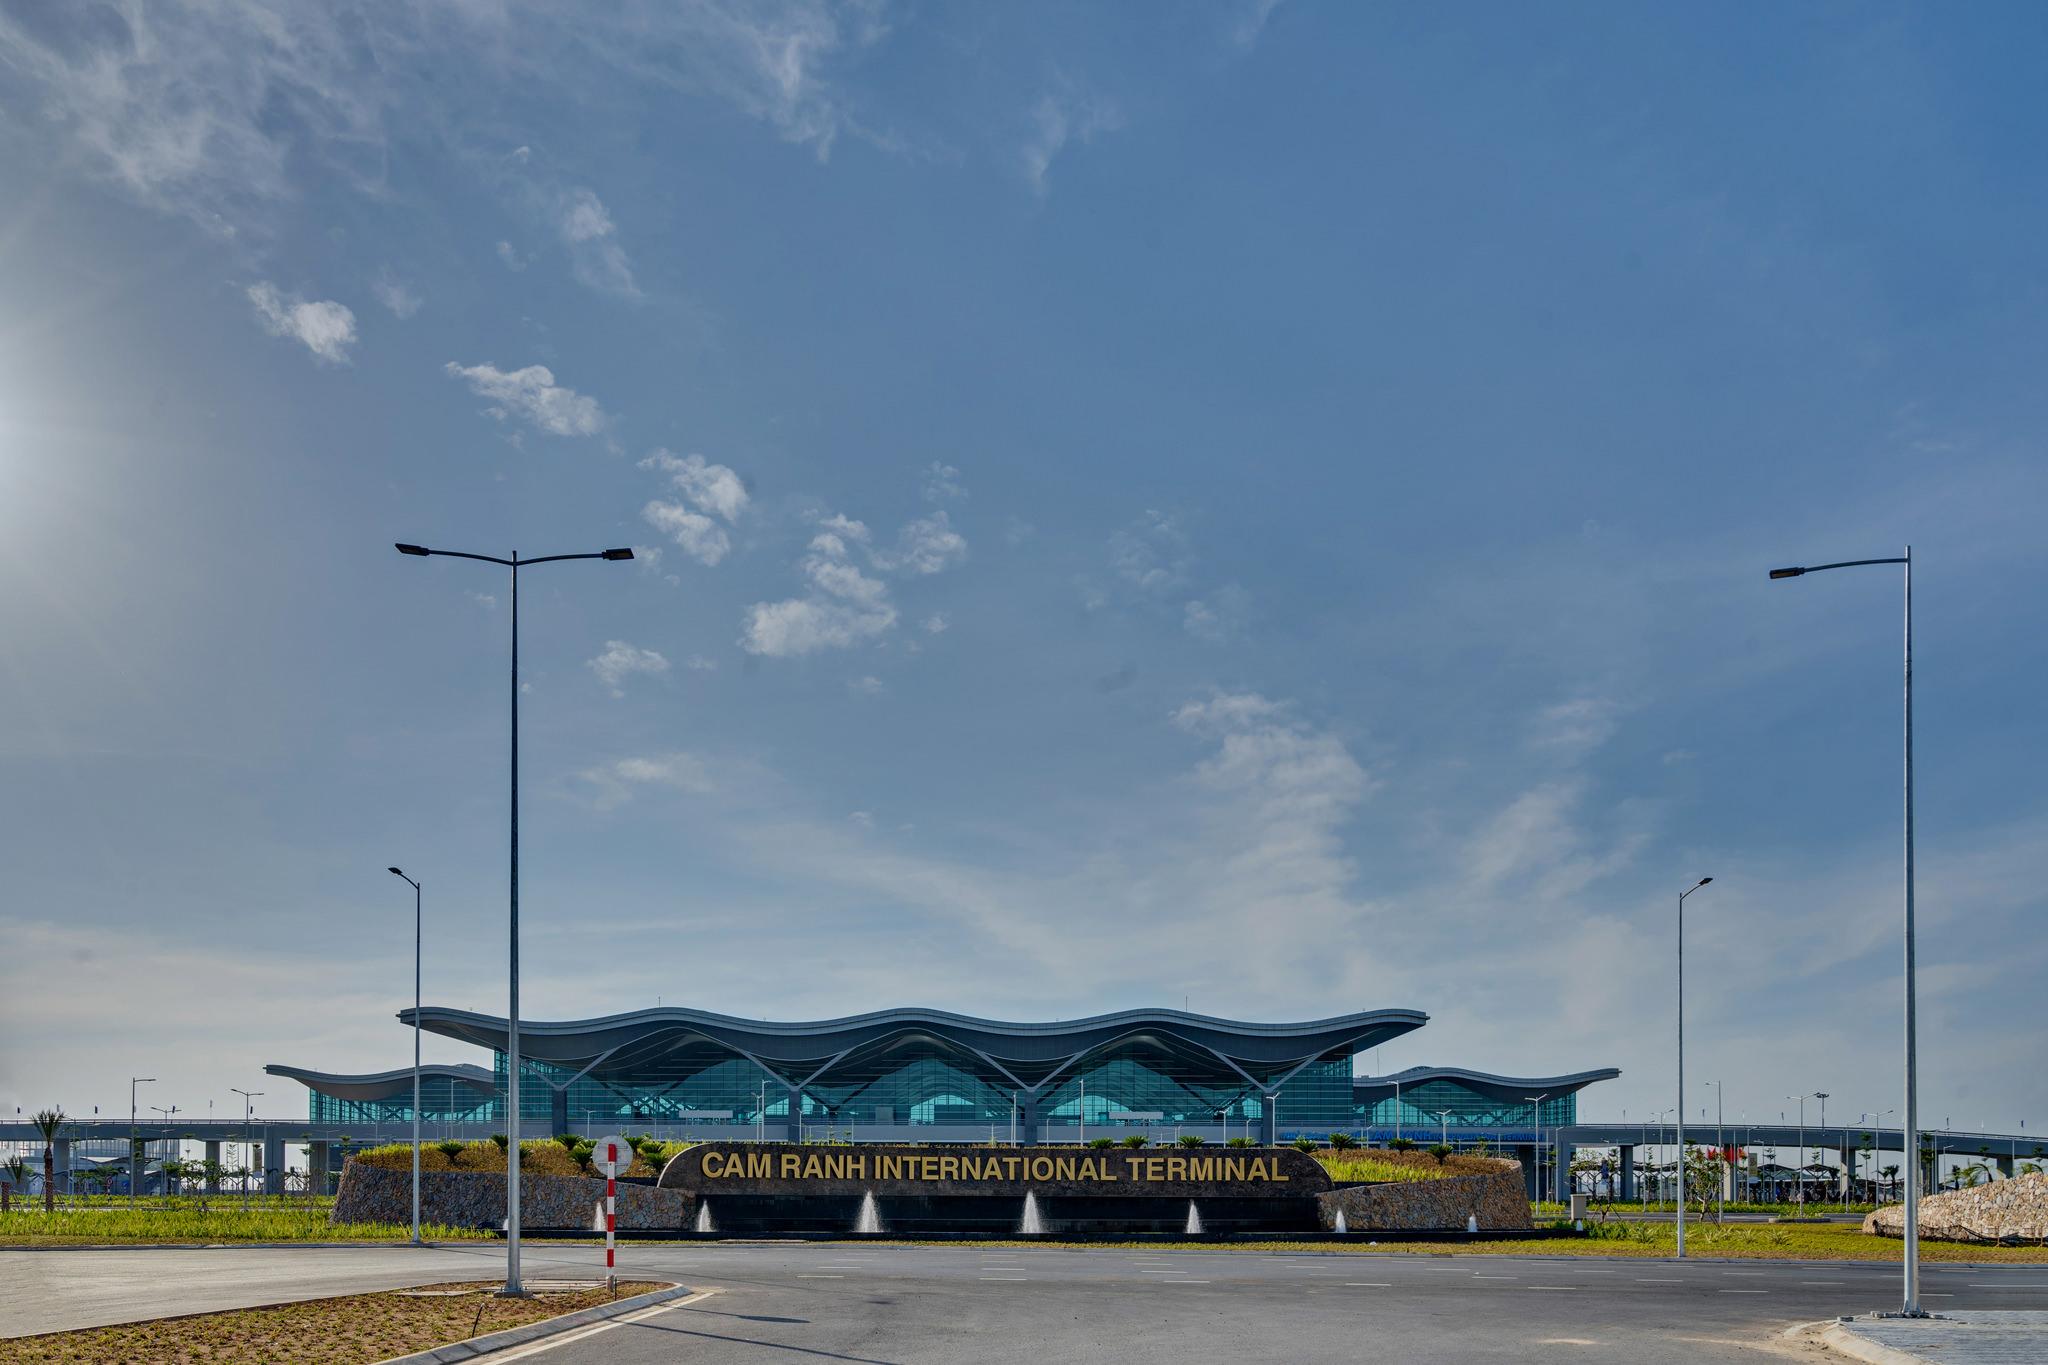 20180626 - Cam Ranh Airport - Architecture - 0242.jpg